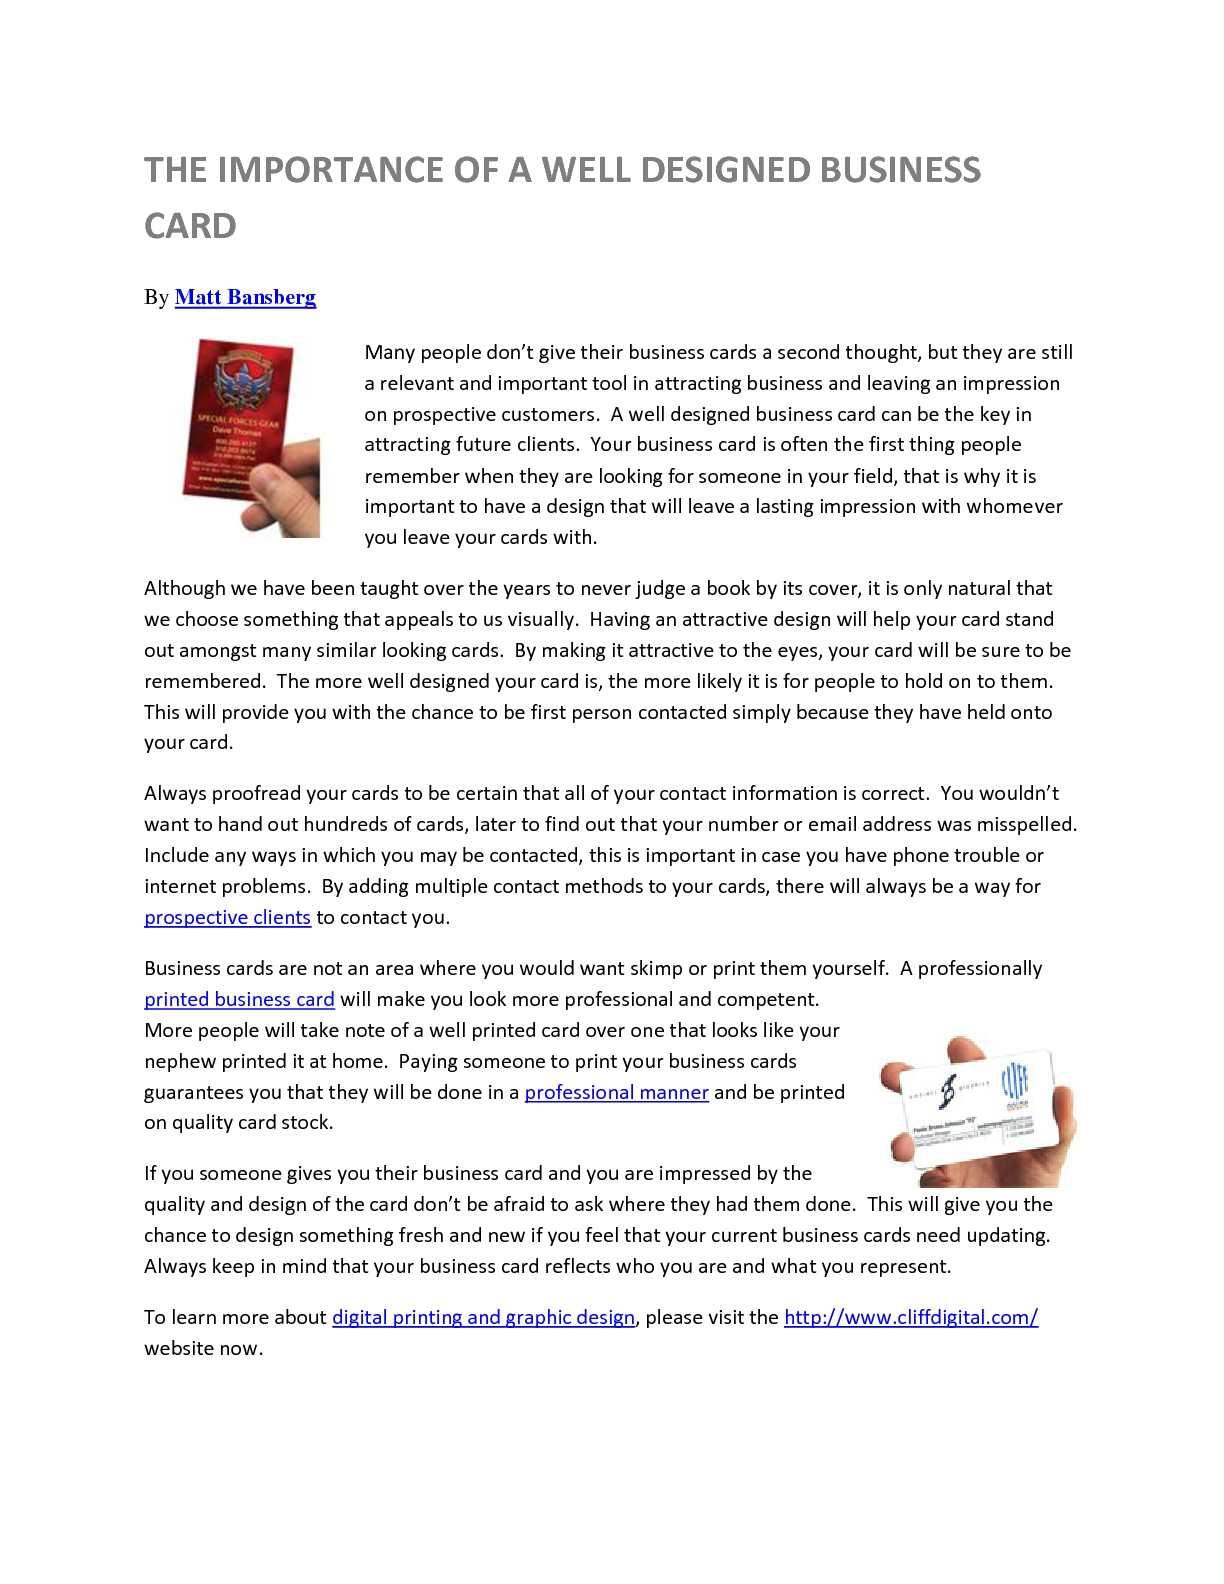 Calamo Importance Of A Well Designed Business Card Cliffdigital